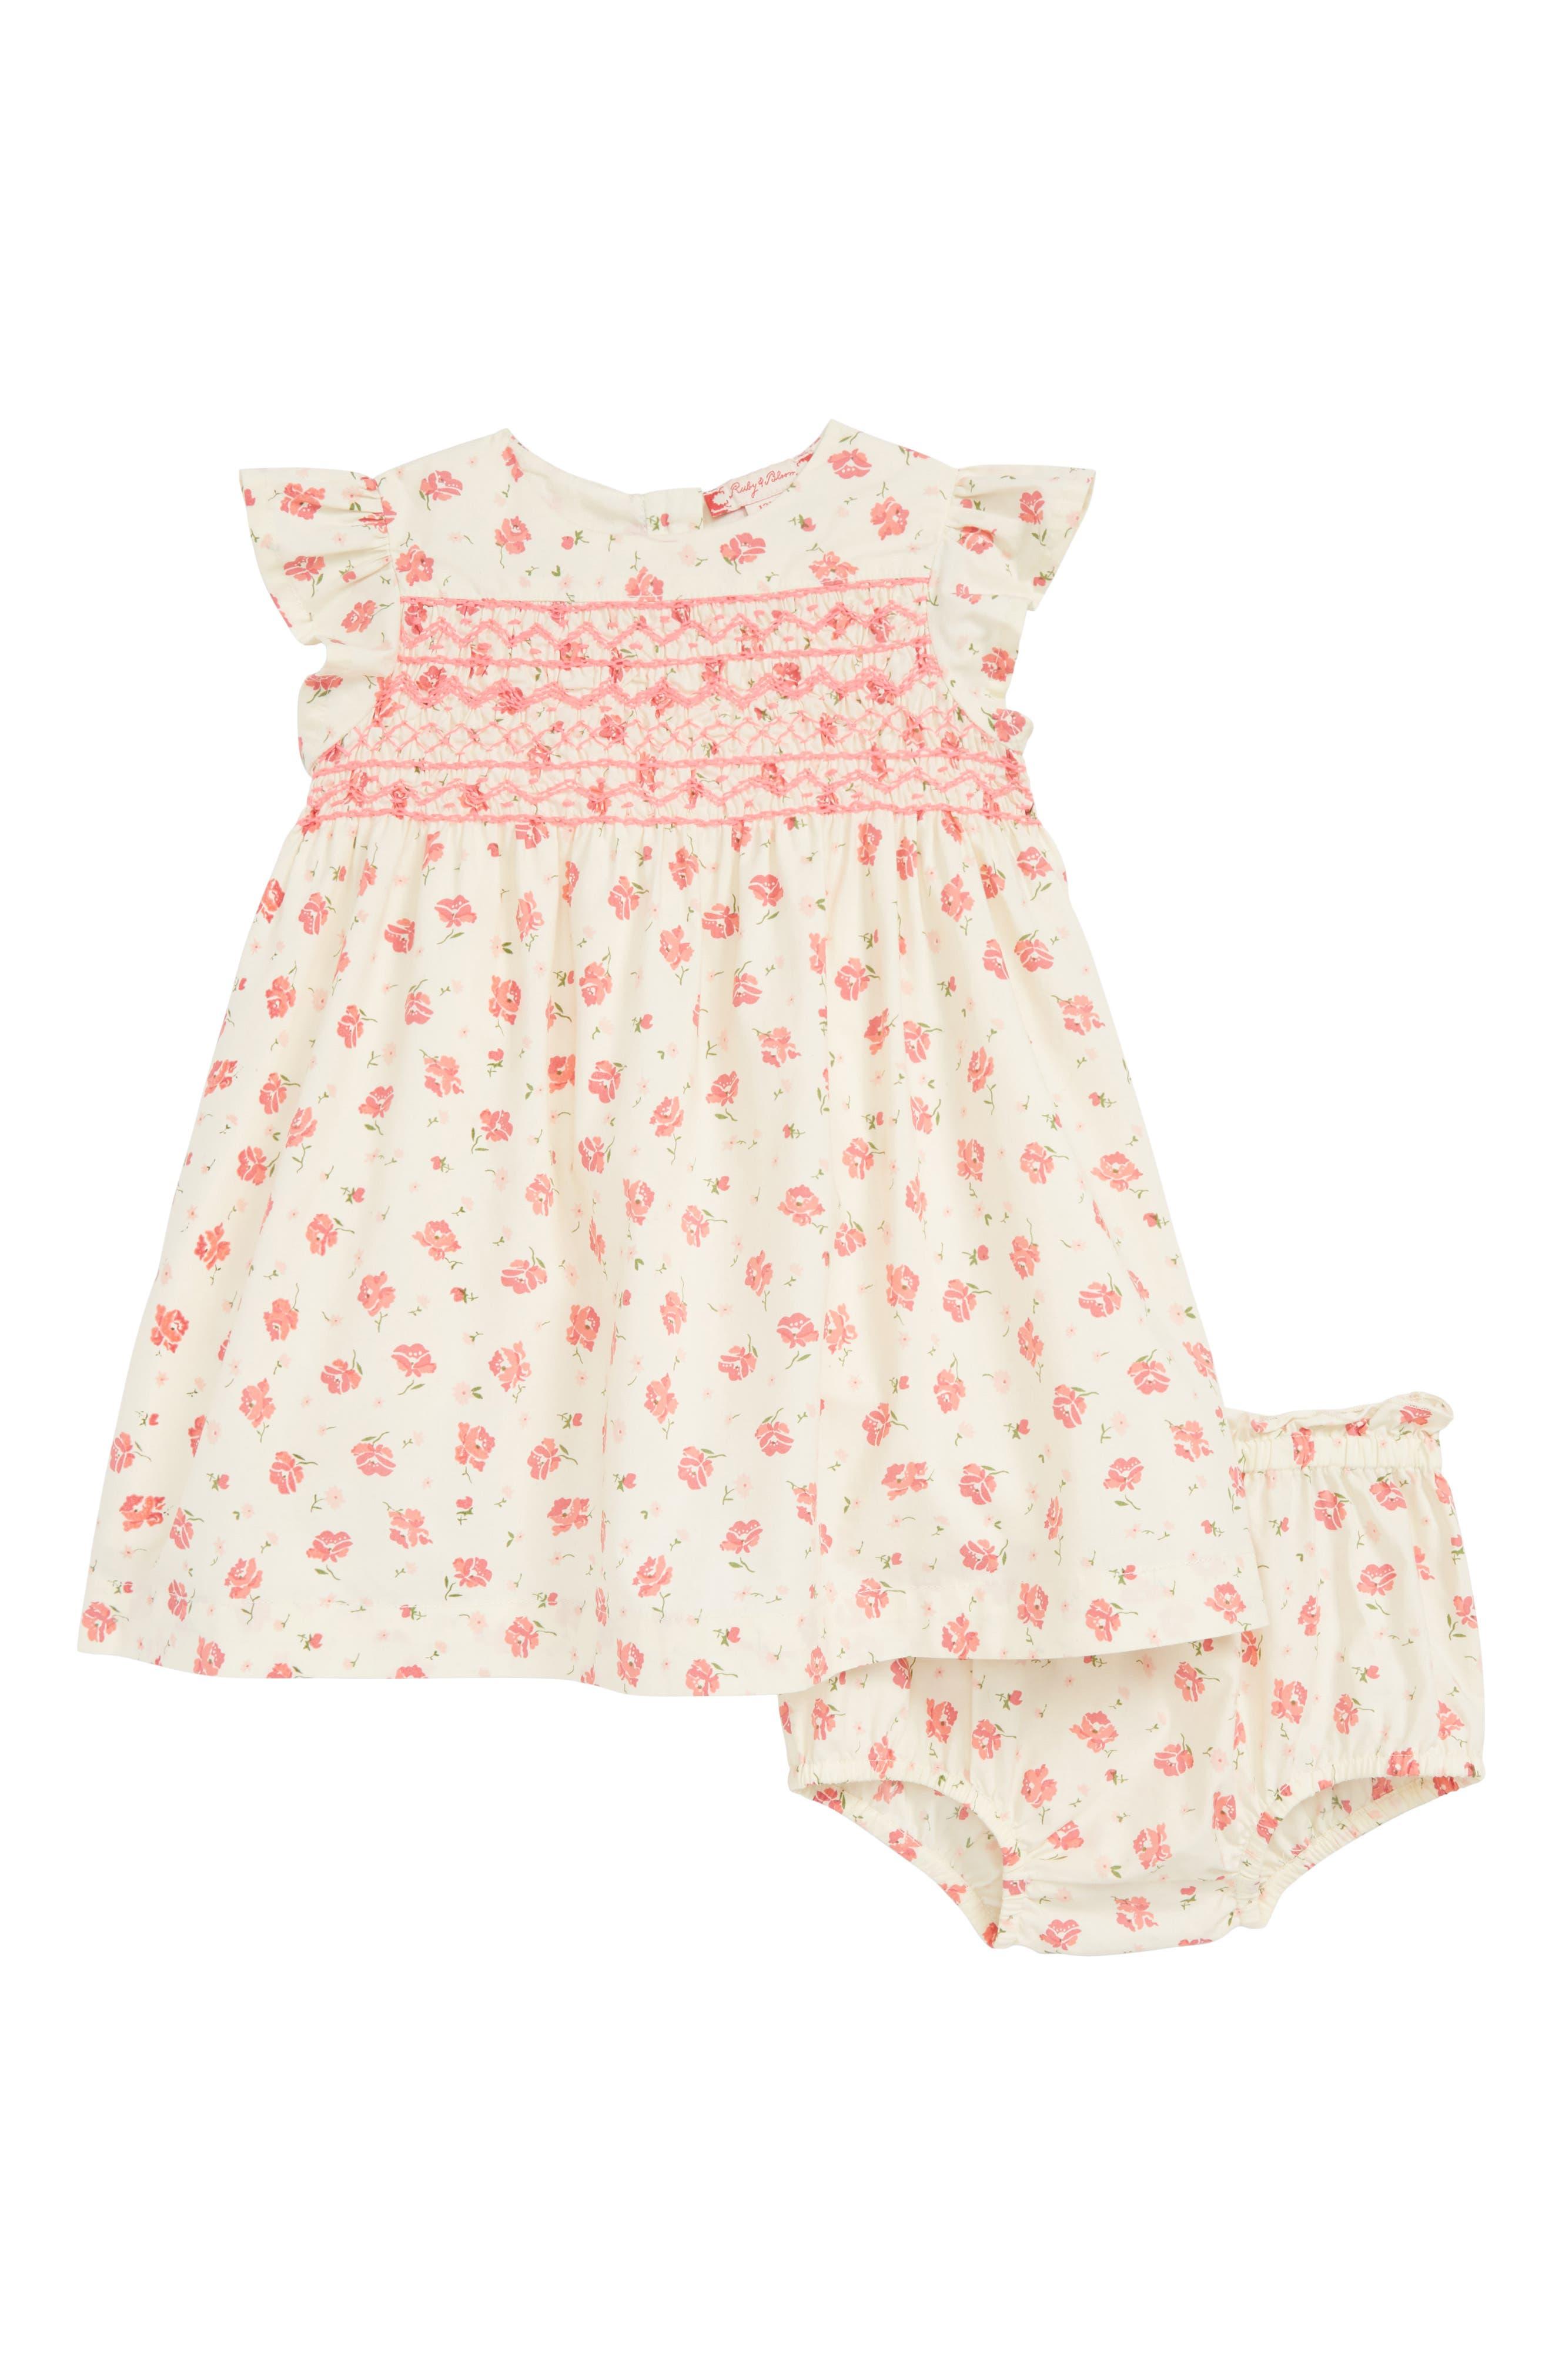 RUBY & BLOOM Lily Print Smocked Dress, Main, color, IVORY EGRET CASCADE FLORAL